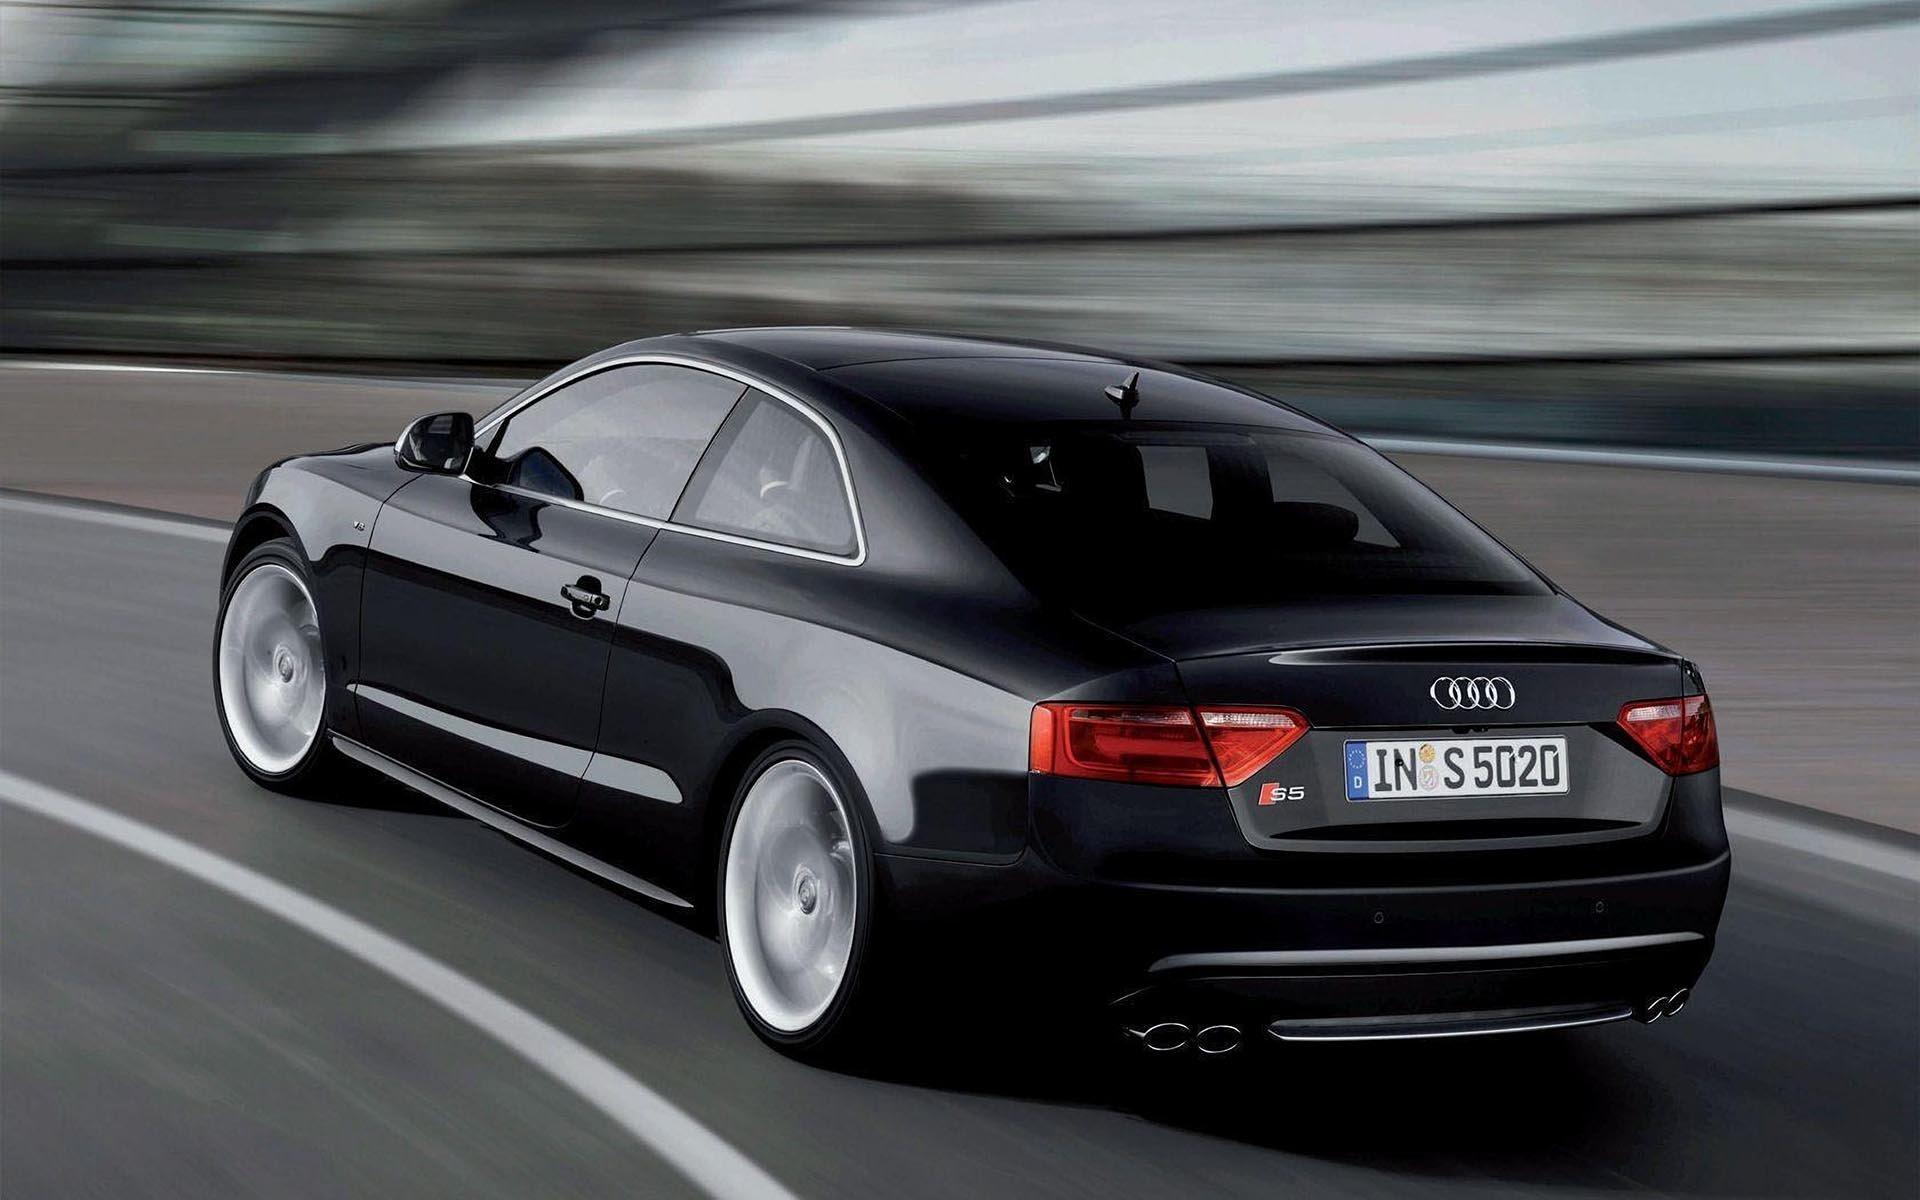 07_Audi B8 S5 4.2 V8 rear